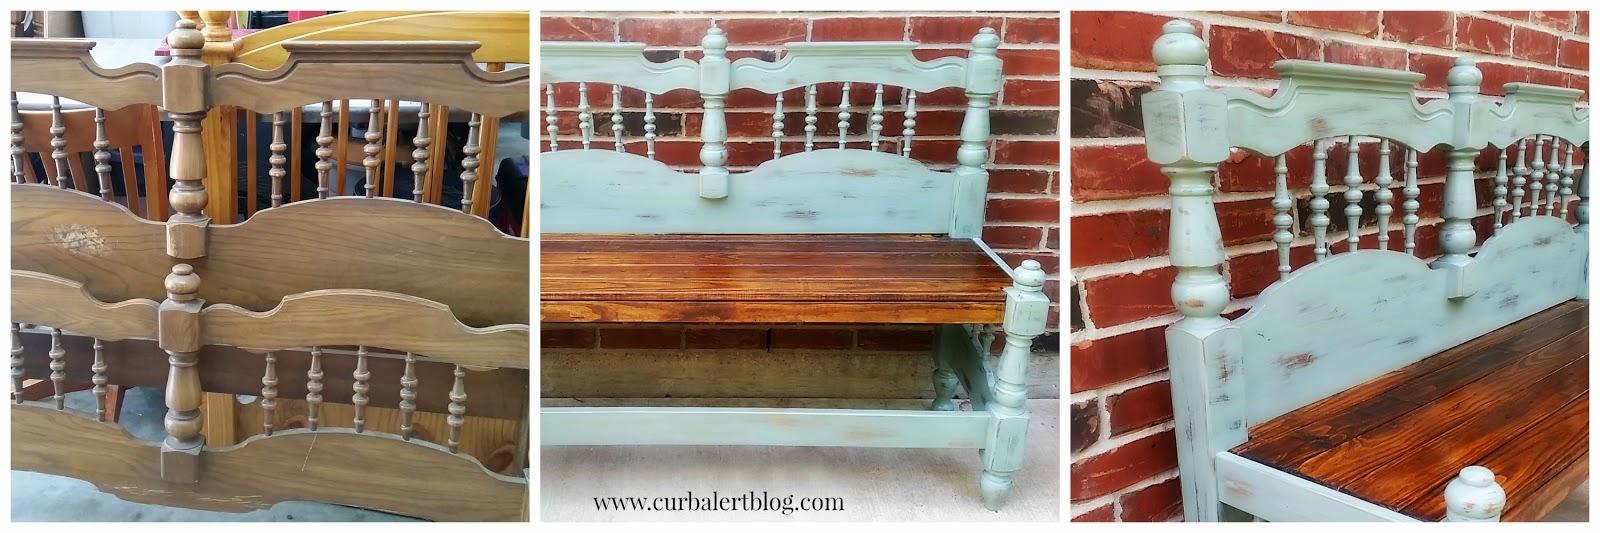 Custom Painted Furniture   Curb Alert